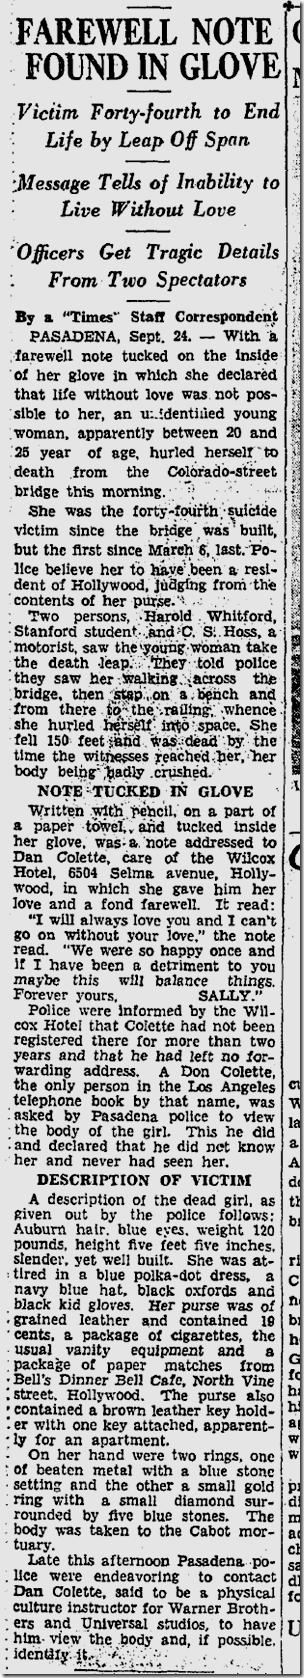 Sept. 25, 1933, Suicide